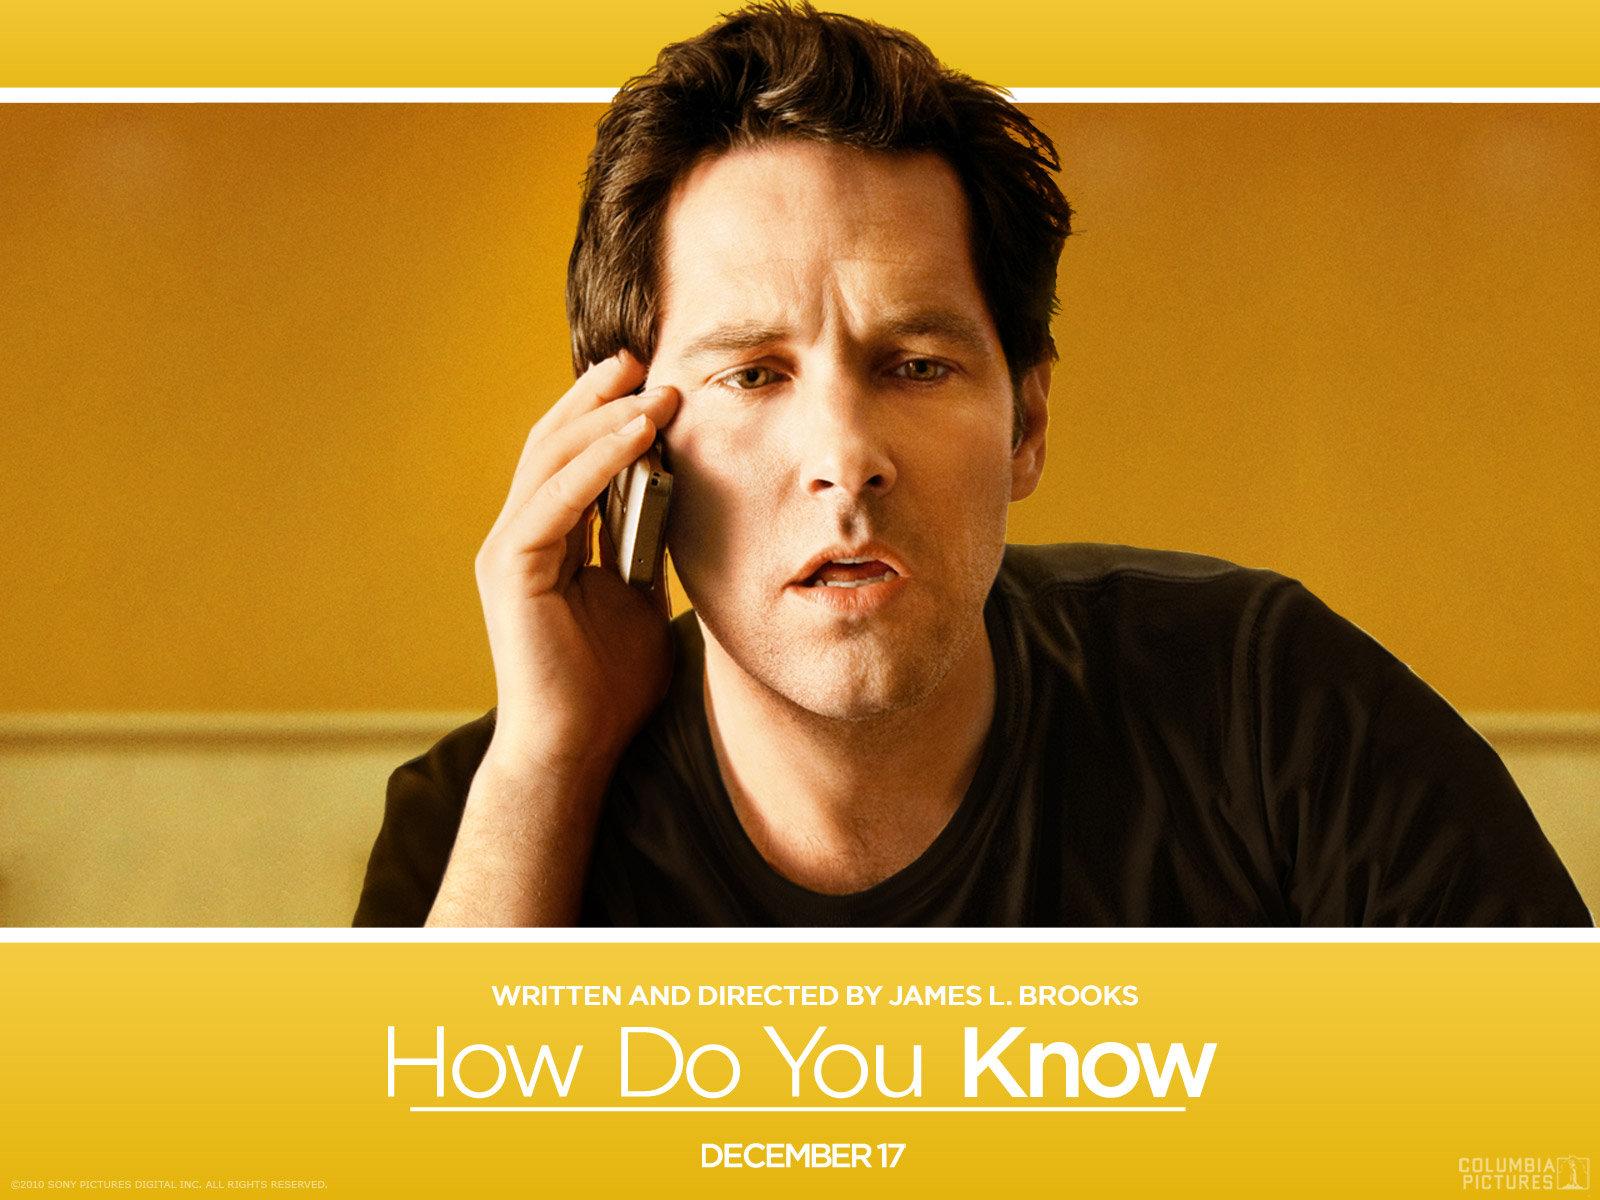 How Do You Know Wallpaper   10024199 1280x1024 Desktop Download 1600x1200